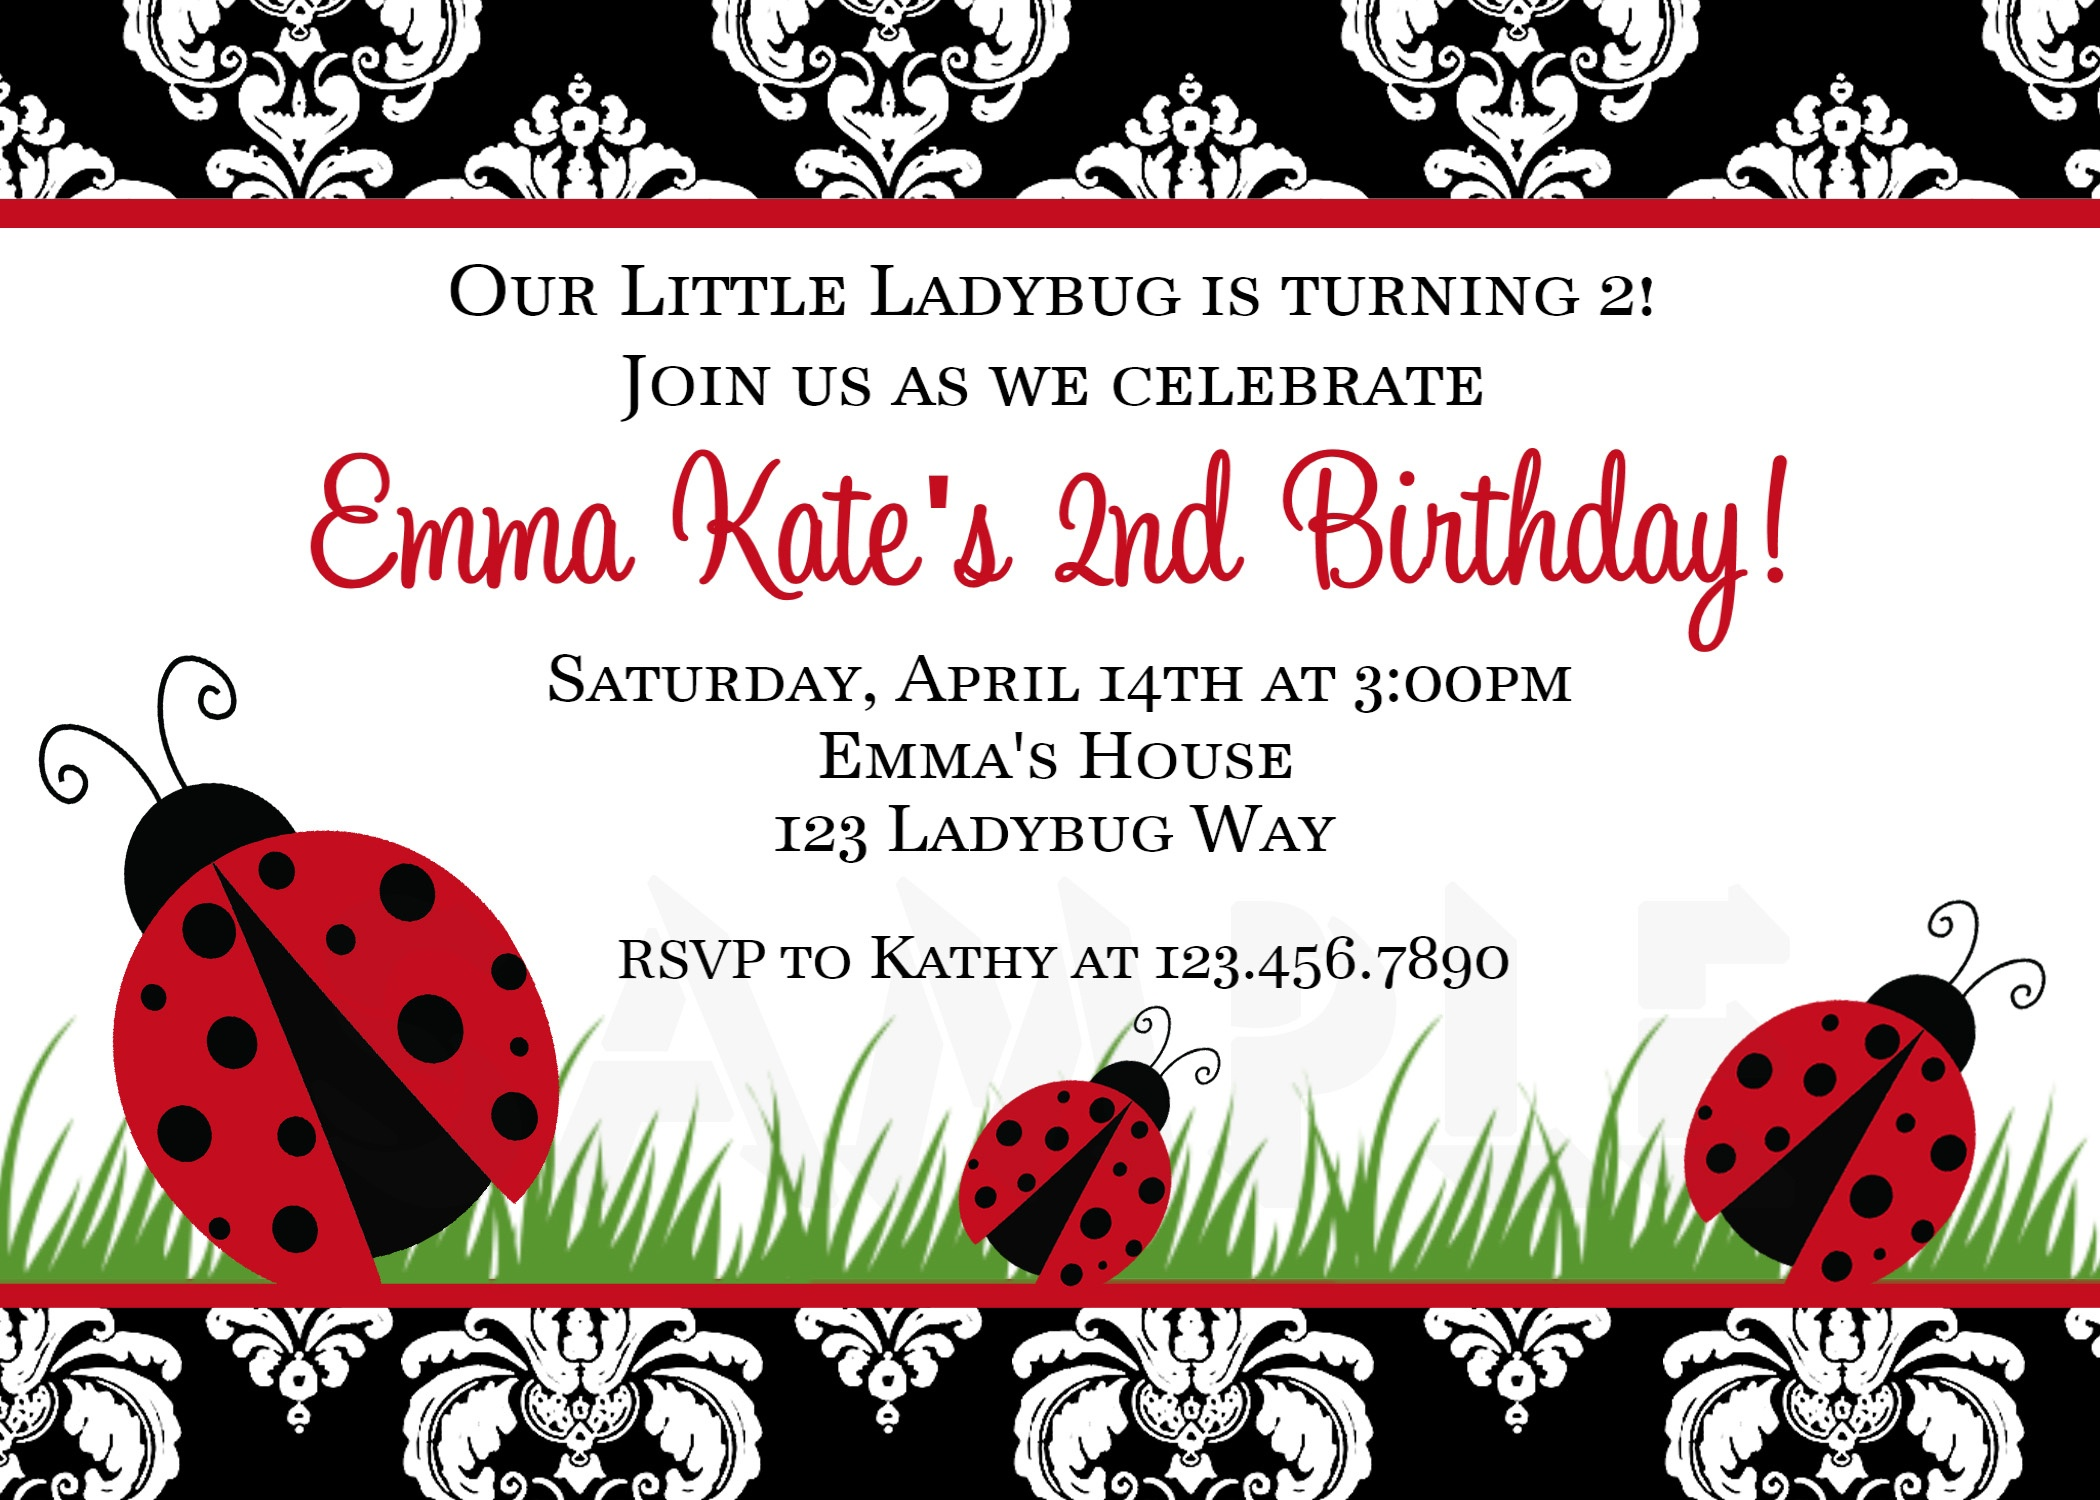 Photo : Printable Birthday Invitations Ladybug Image - Free Printable Ladybug Baby Shower Invitations Templates